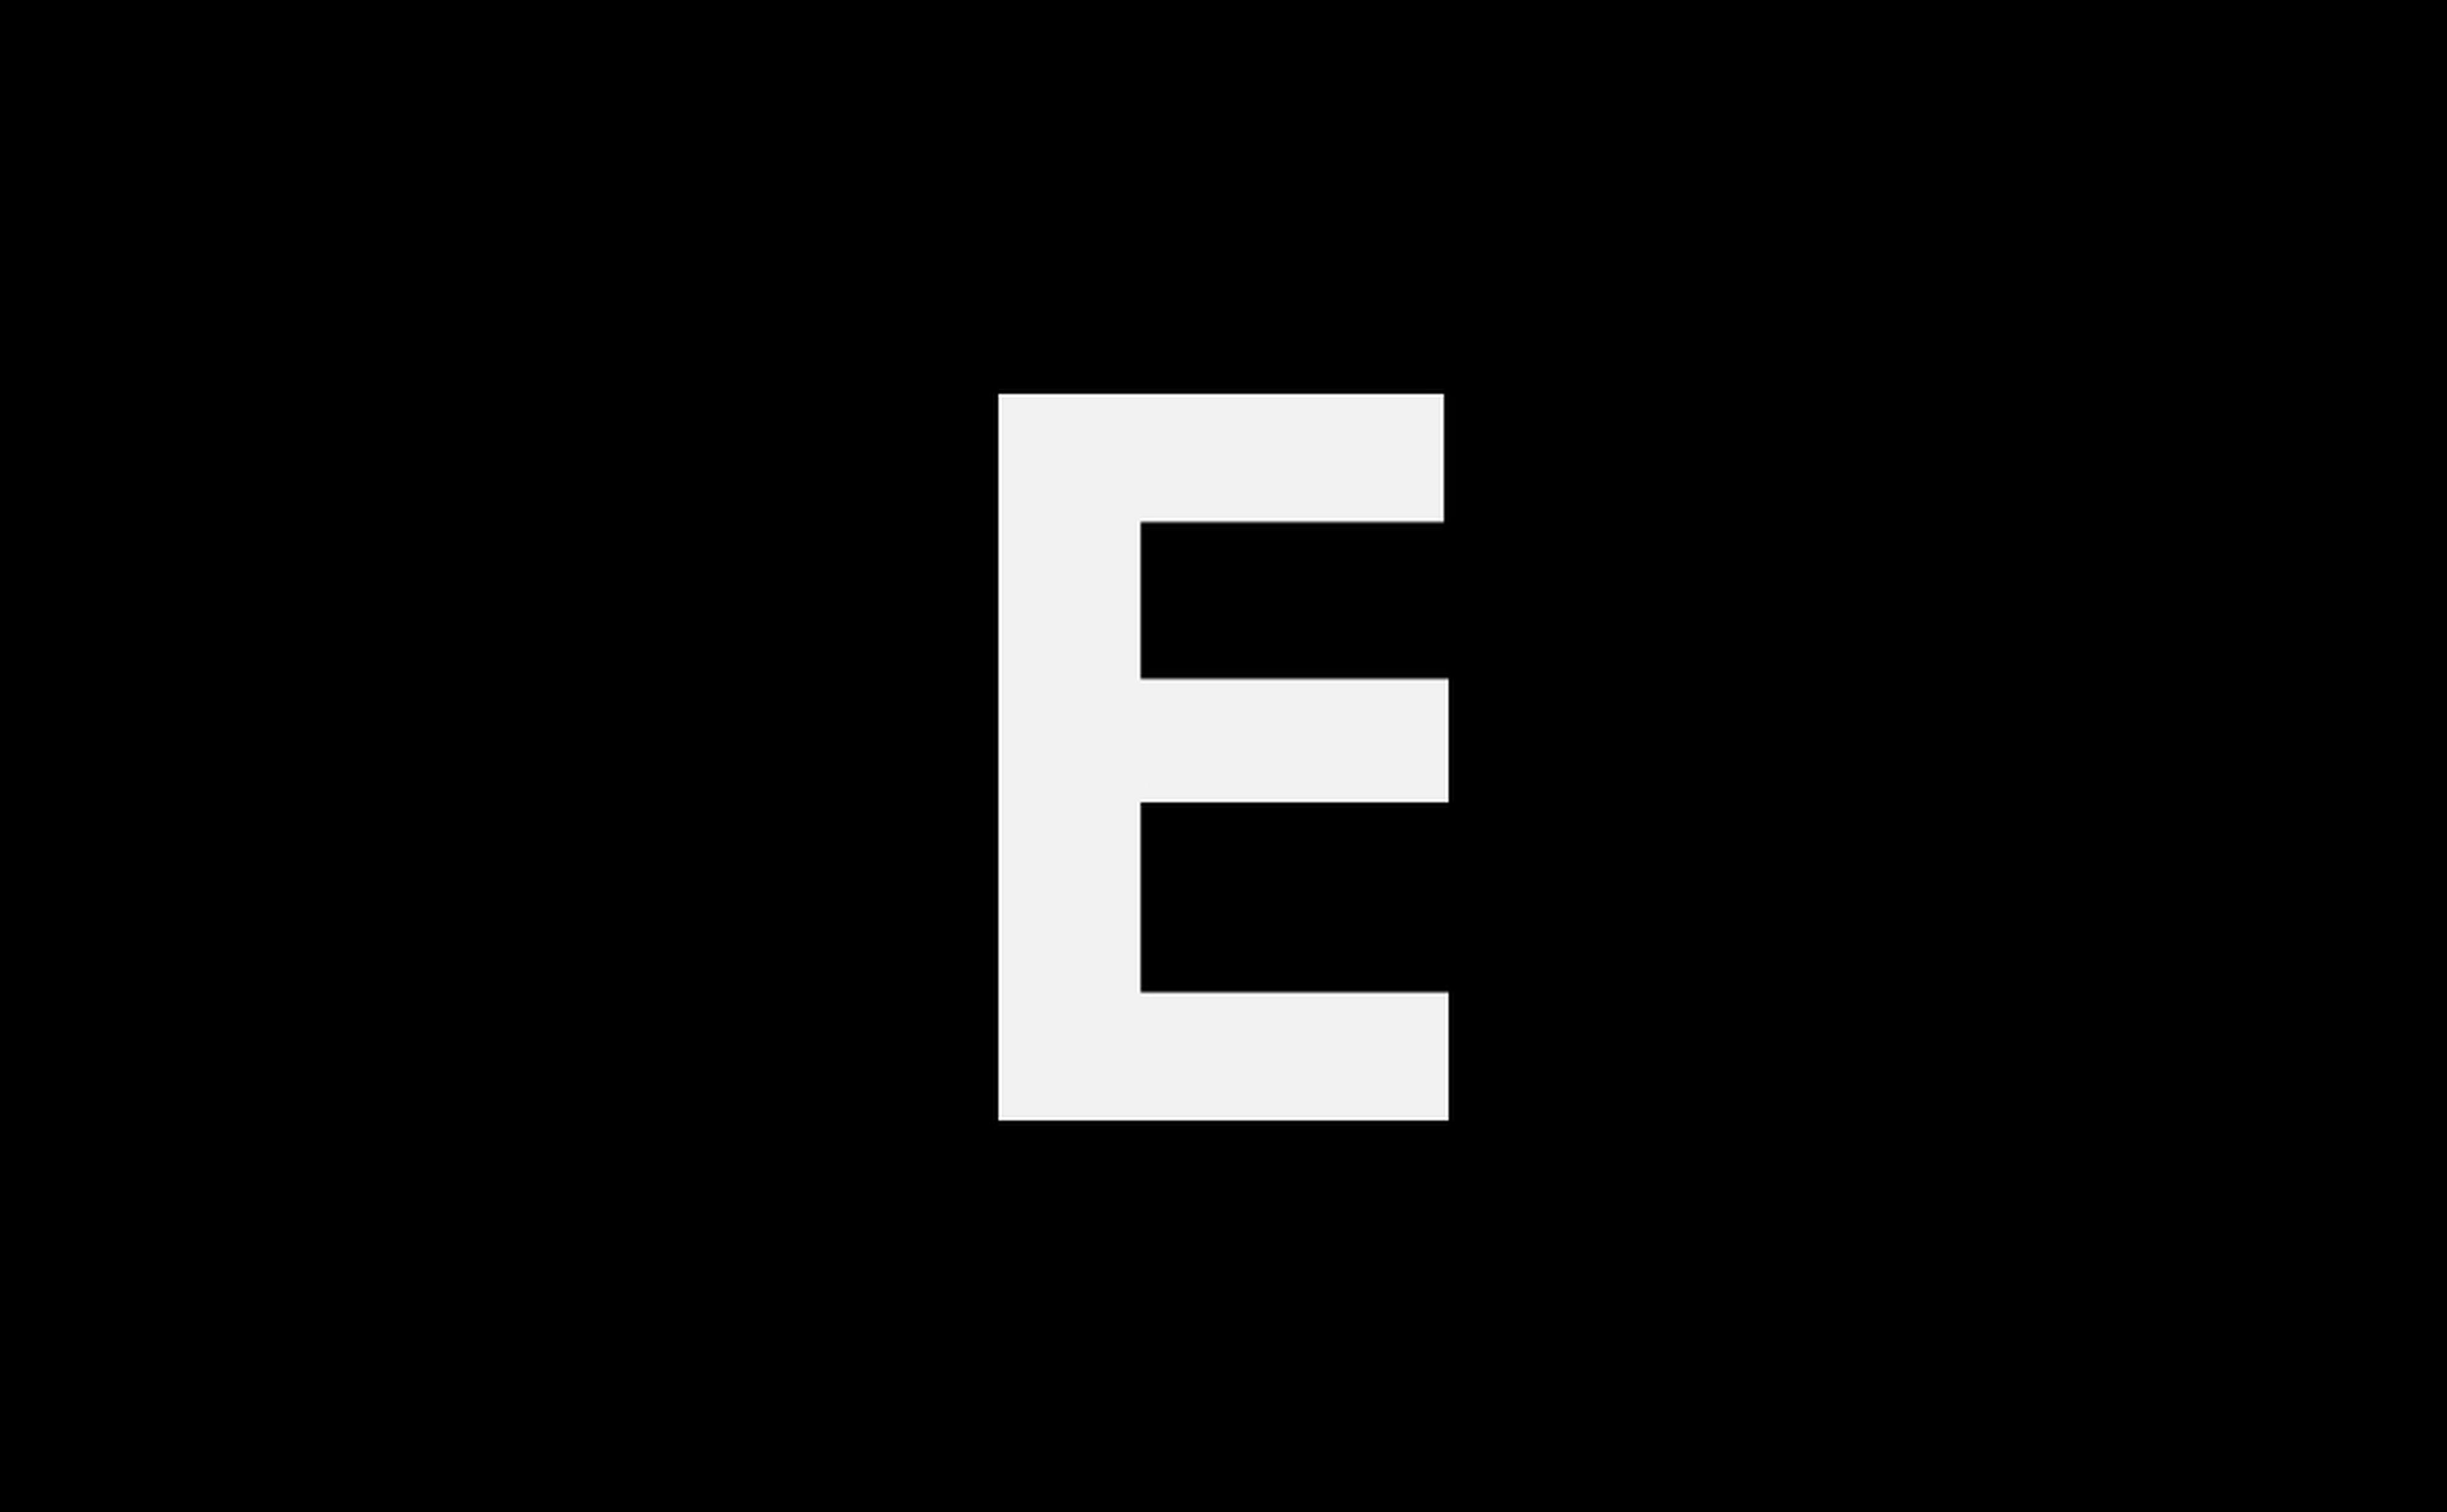 ferris wheel, amusement park ride, amusement park, arts culture and entertainment, built structure, architecture, low angle view, clear sky, sky, building exterior, travel destinations, famous place, circle, tourism, outdoors, travel, metal, tall - high, big wheel, tower